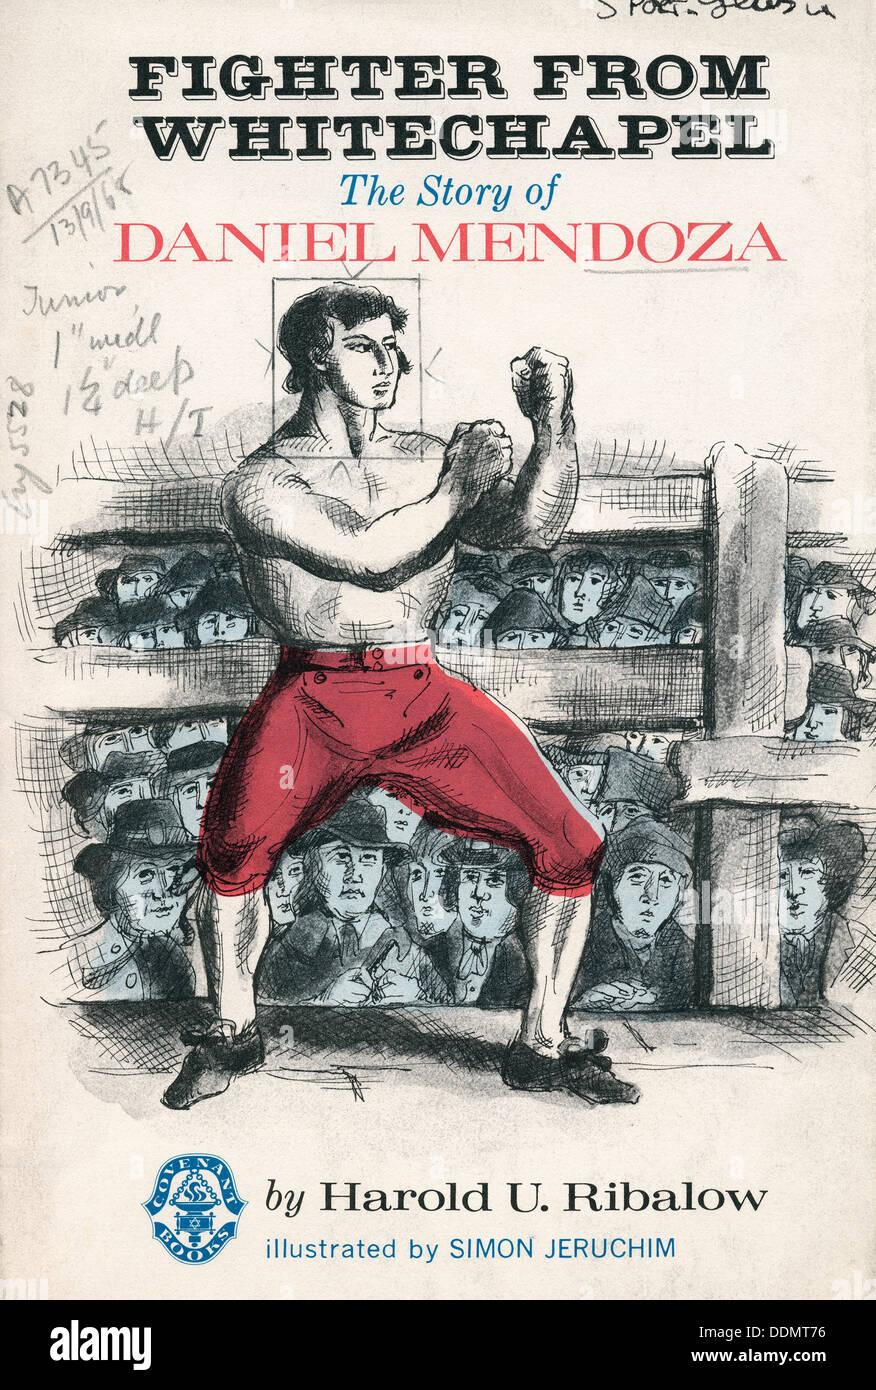 Daniel Mendoza (1764-1836), Jewish boxer. - Stock Image